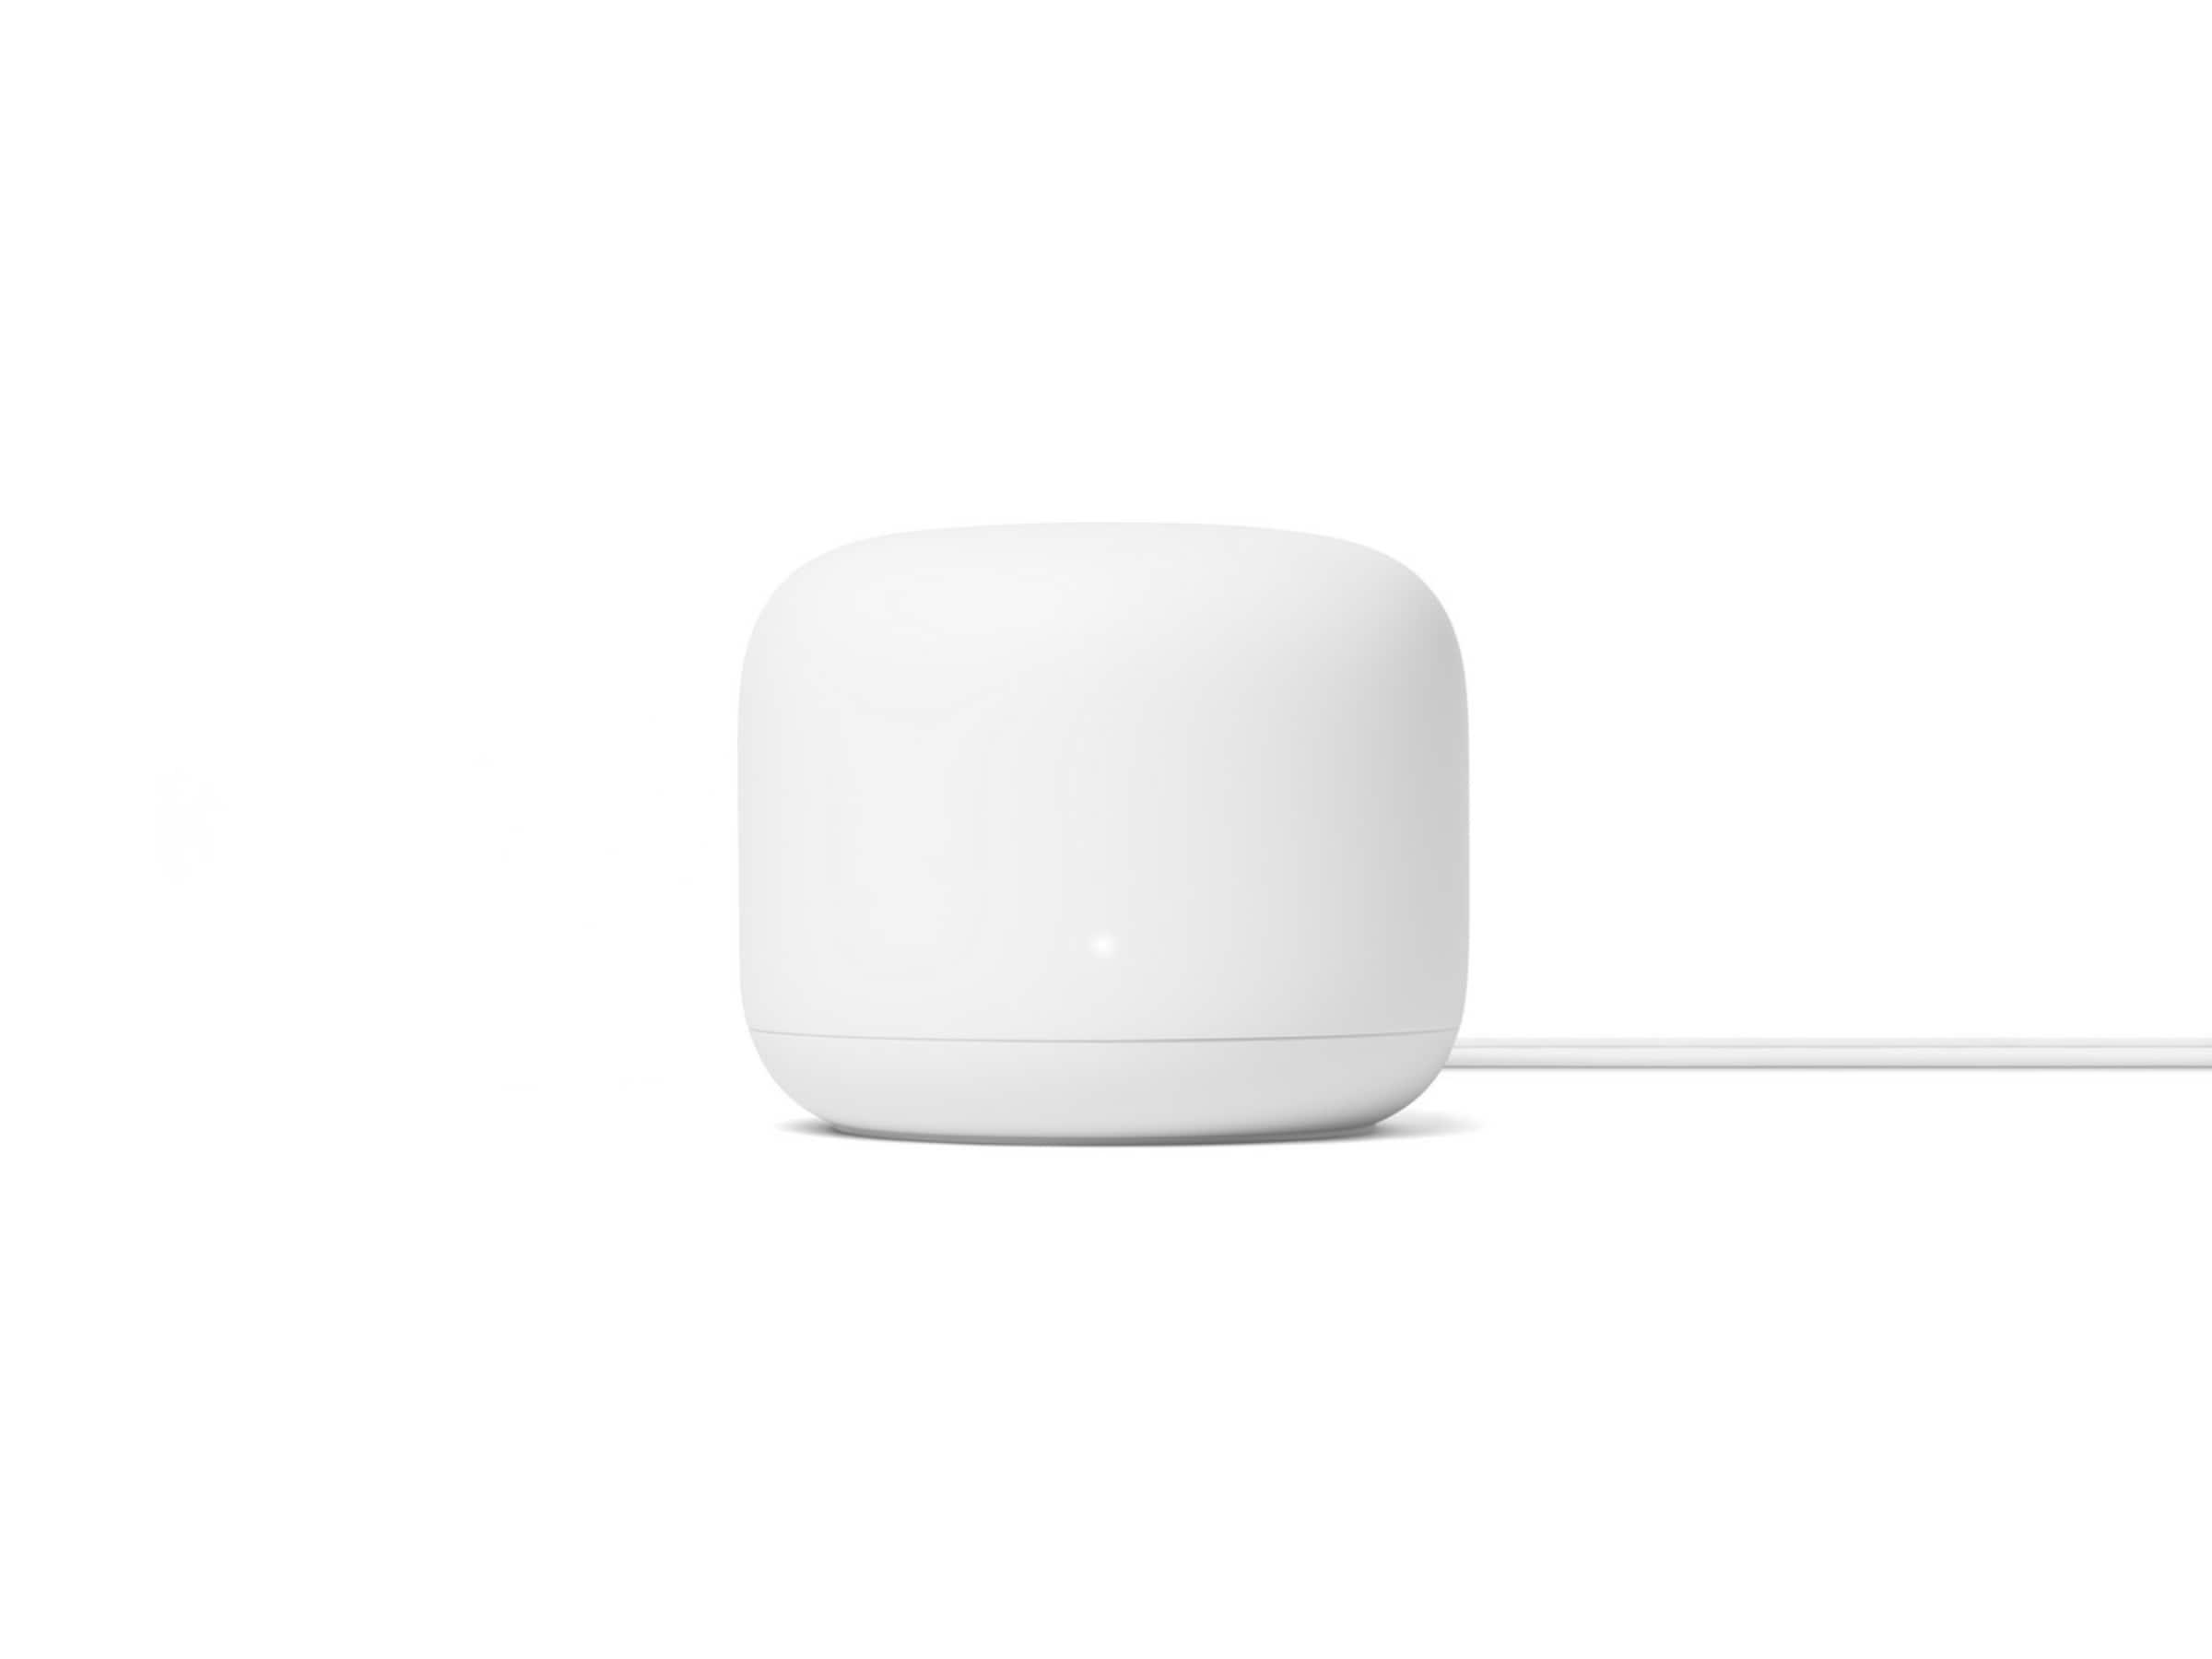 Google - Nest Wifi Router